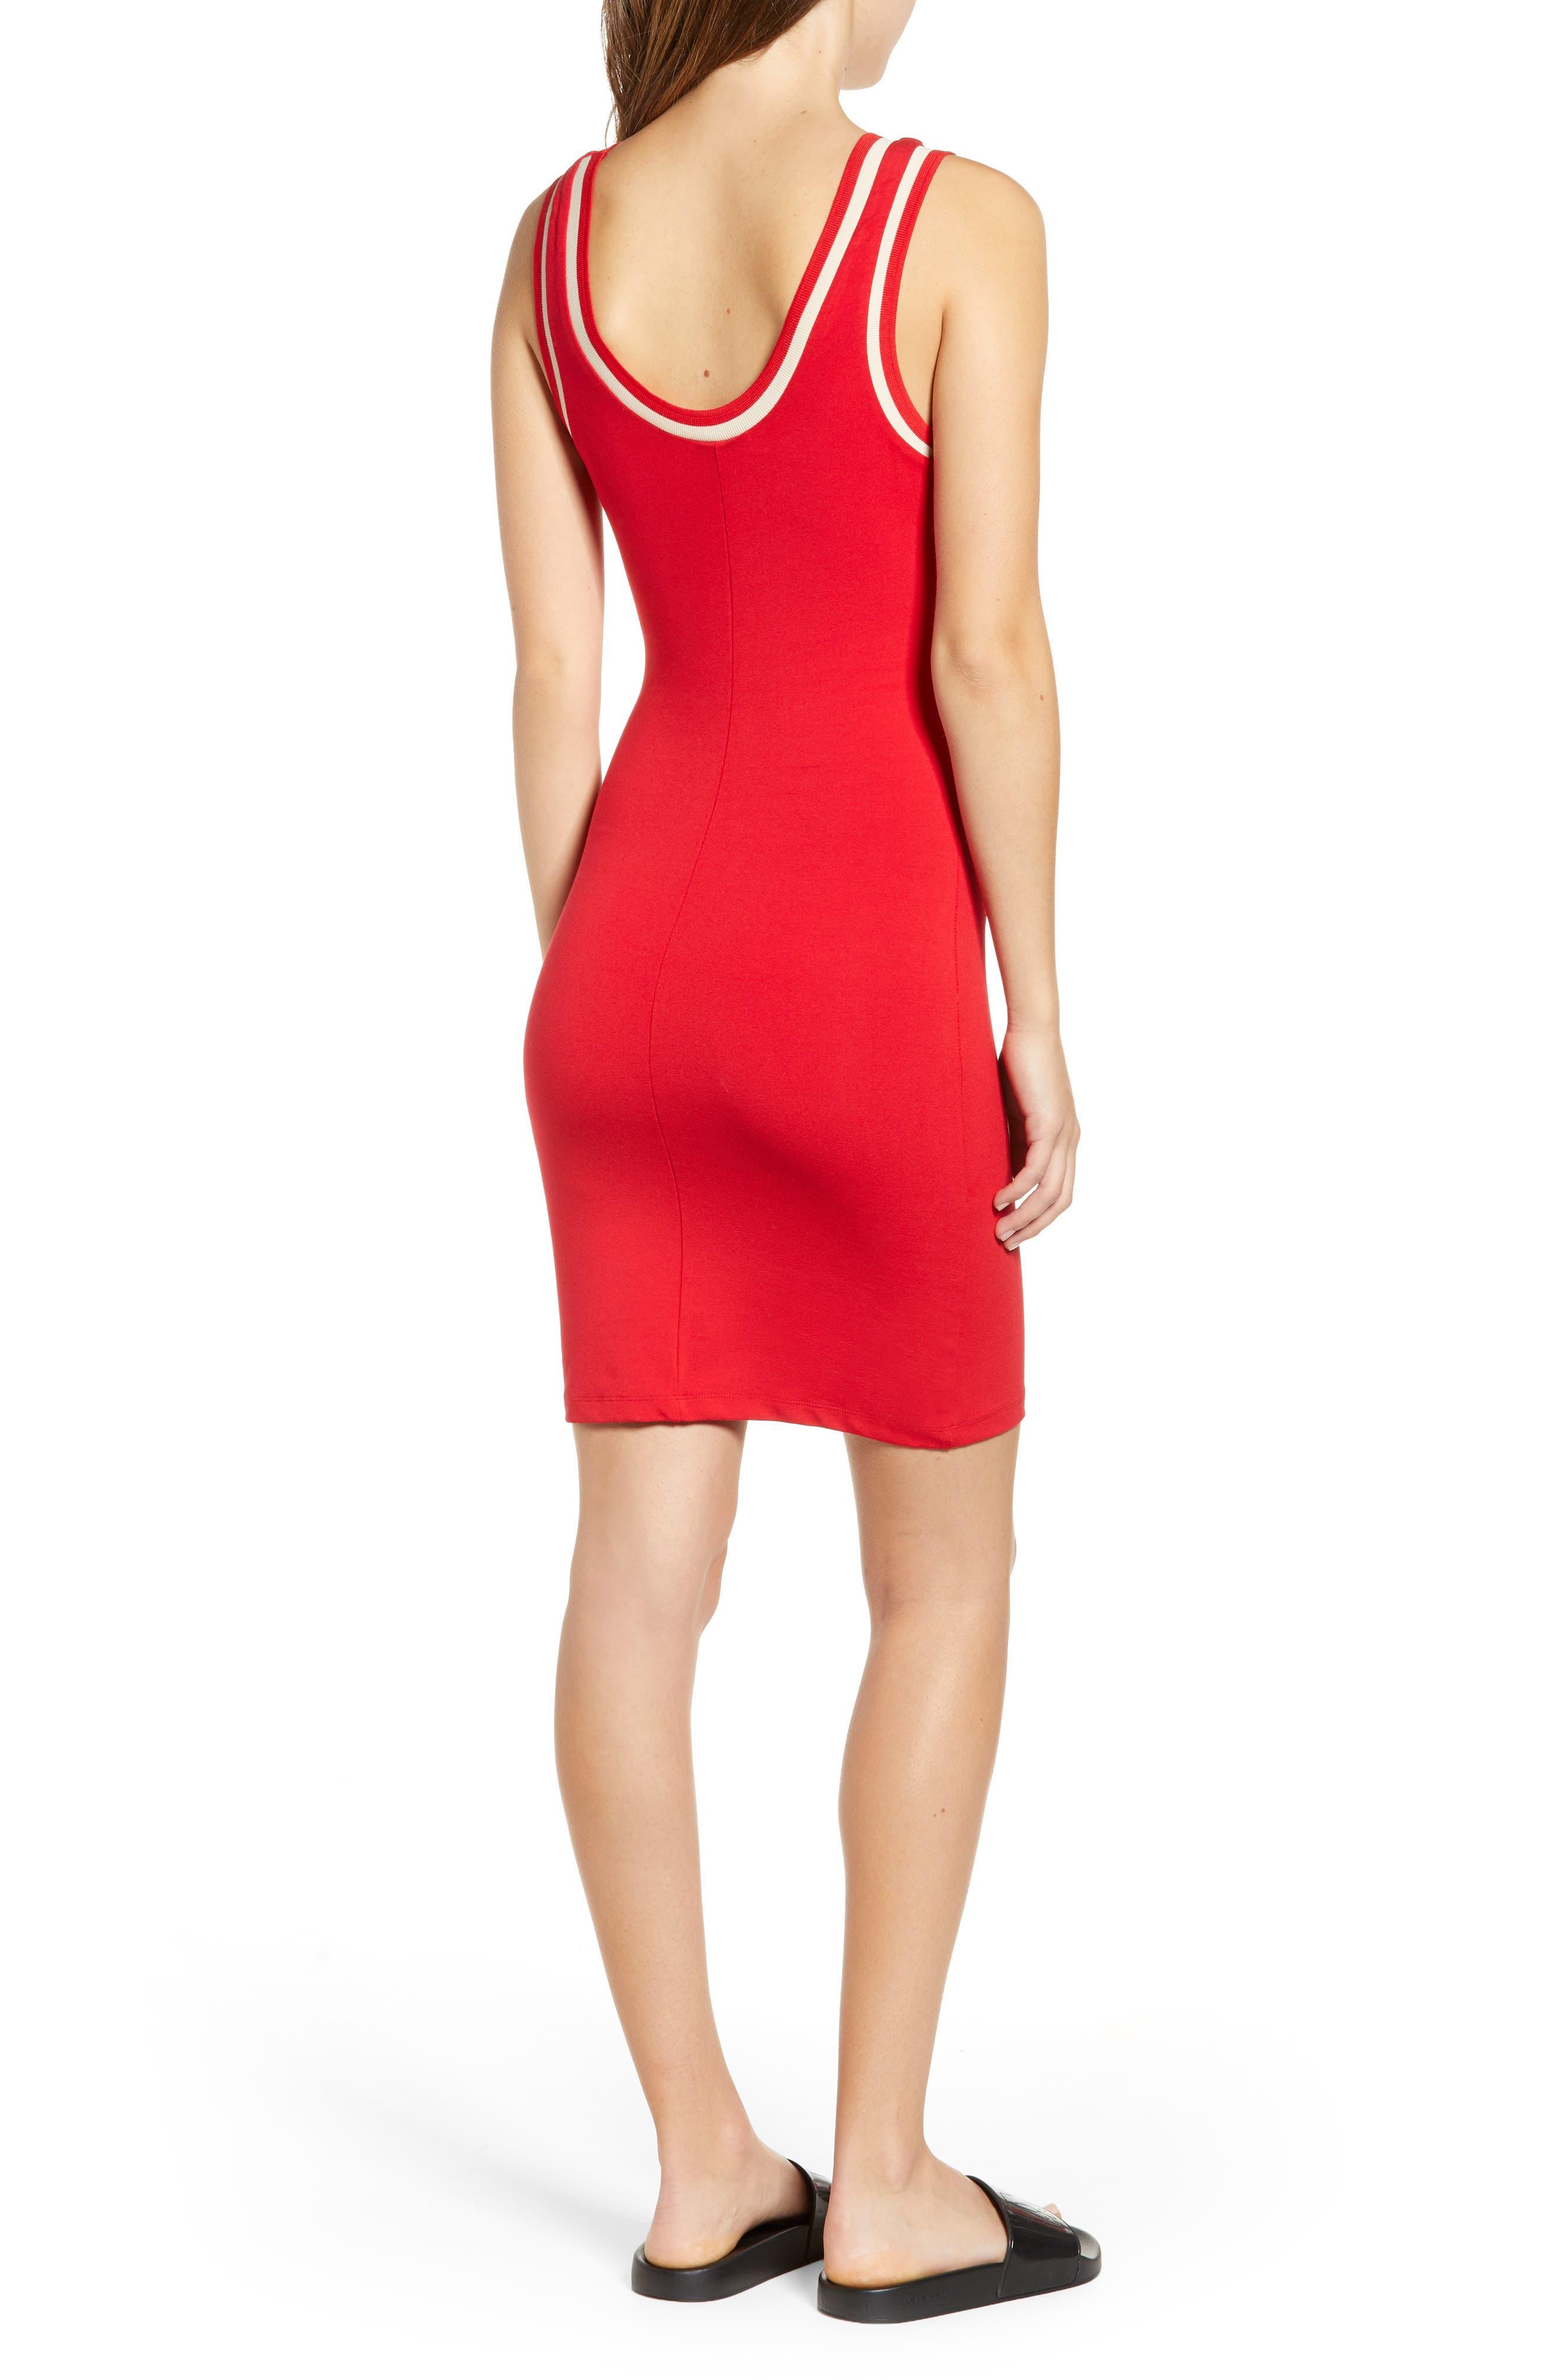 60e7c4ae62 Women s IVY PARK® Clothing